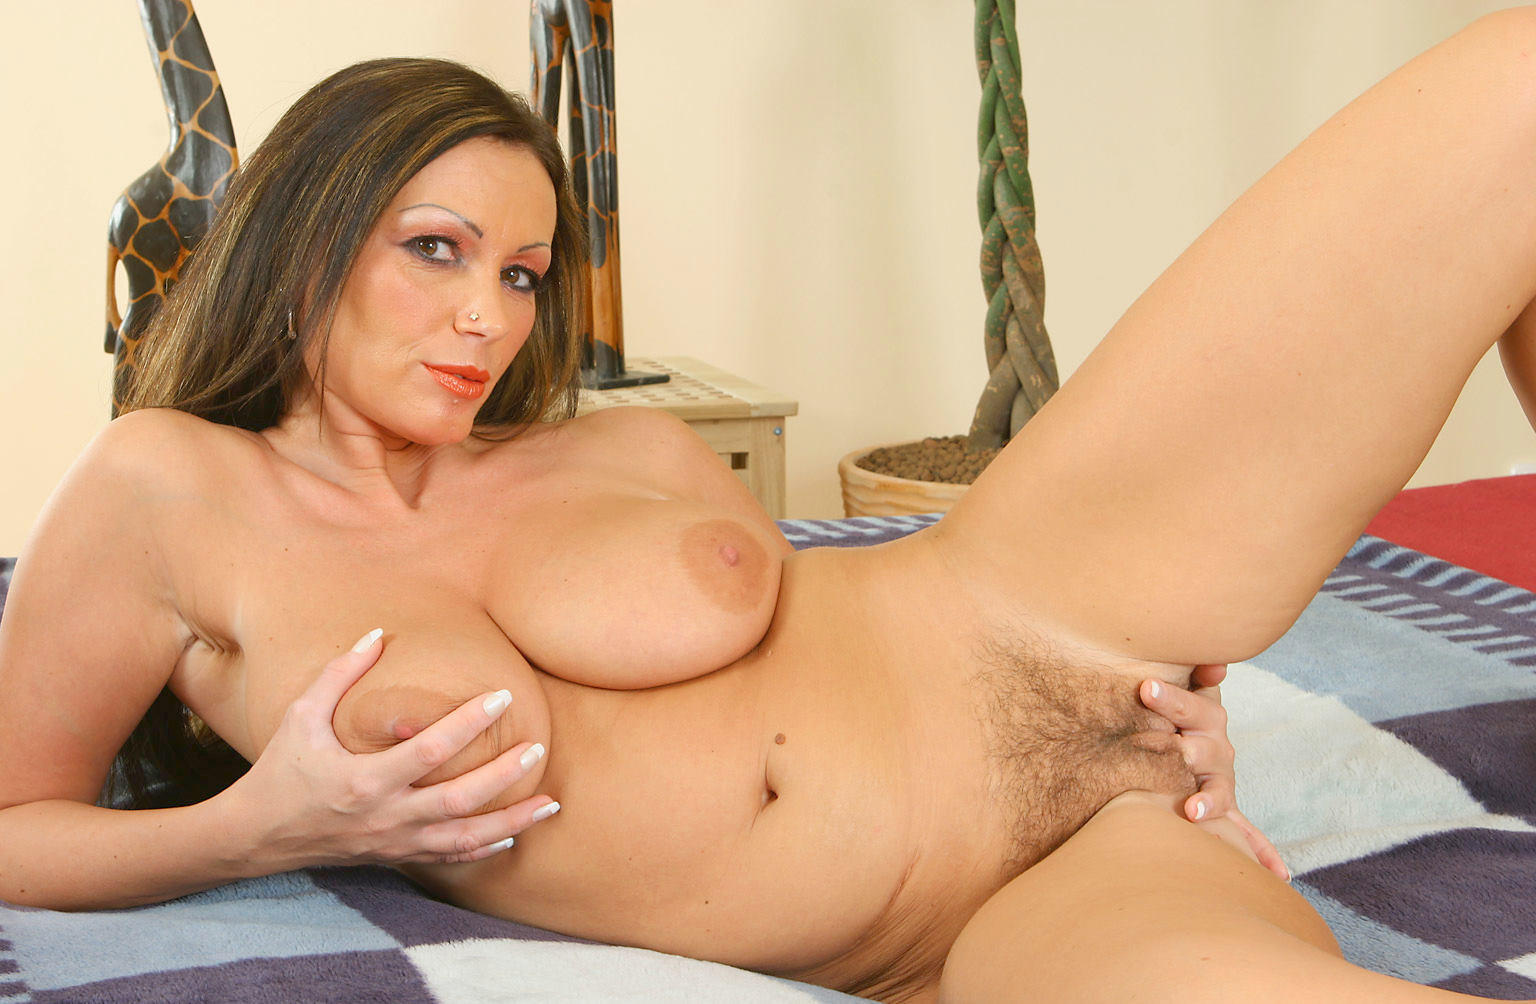 Big tits and bush